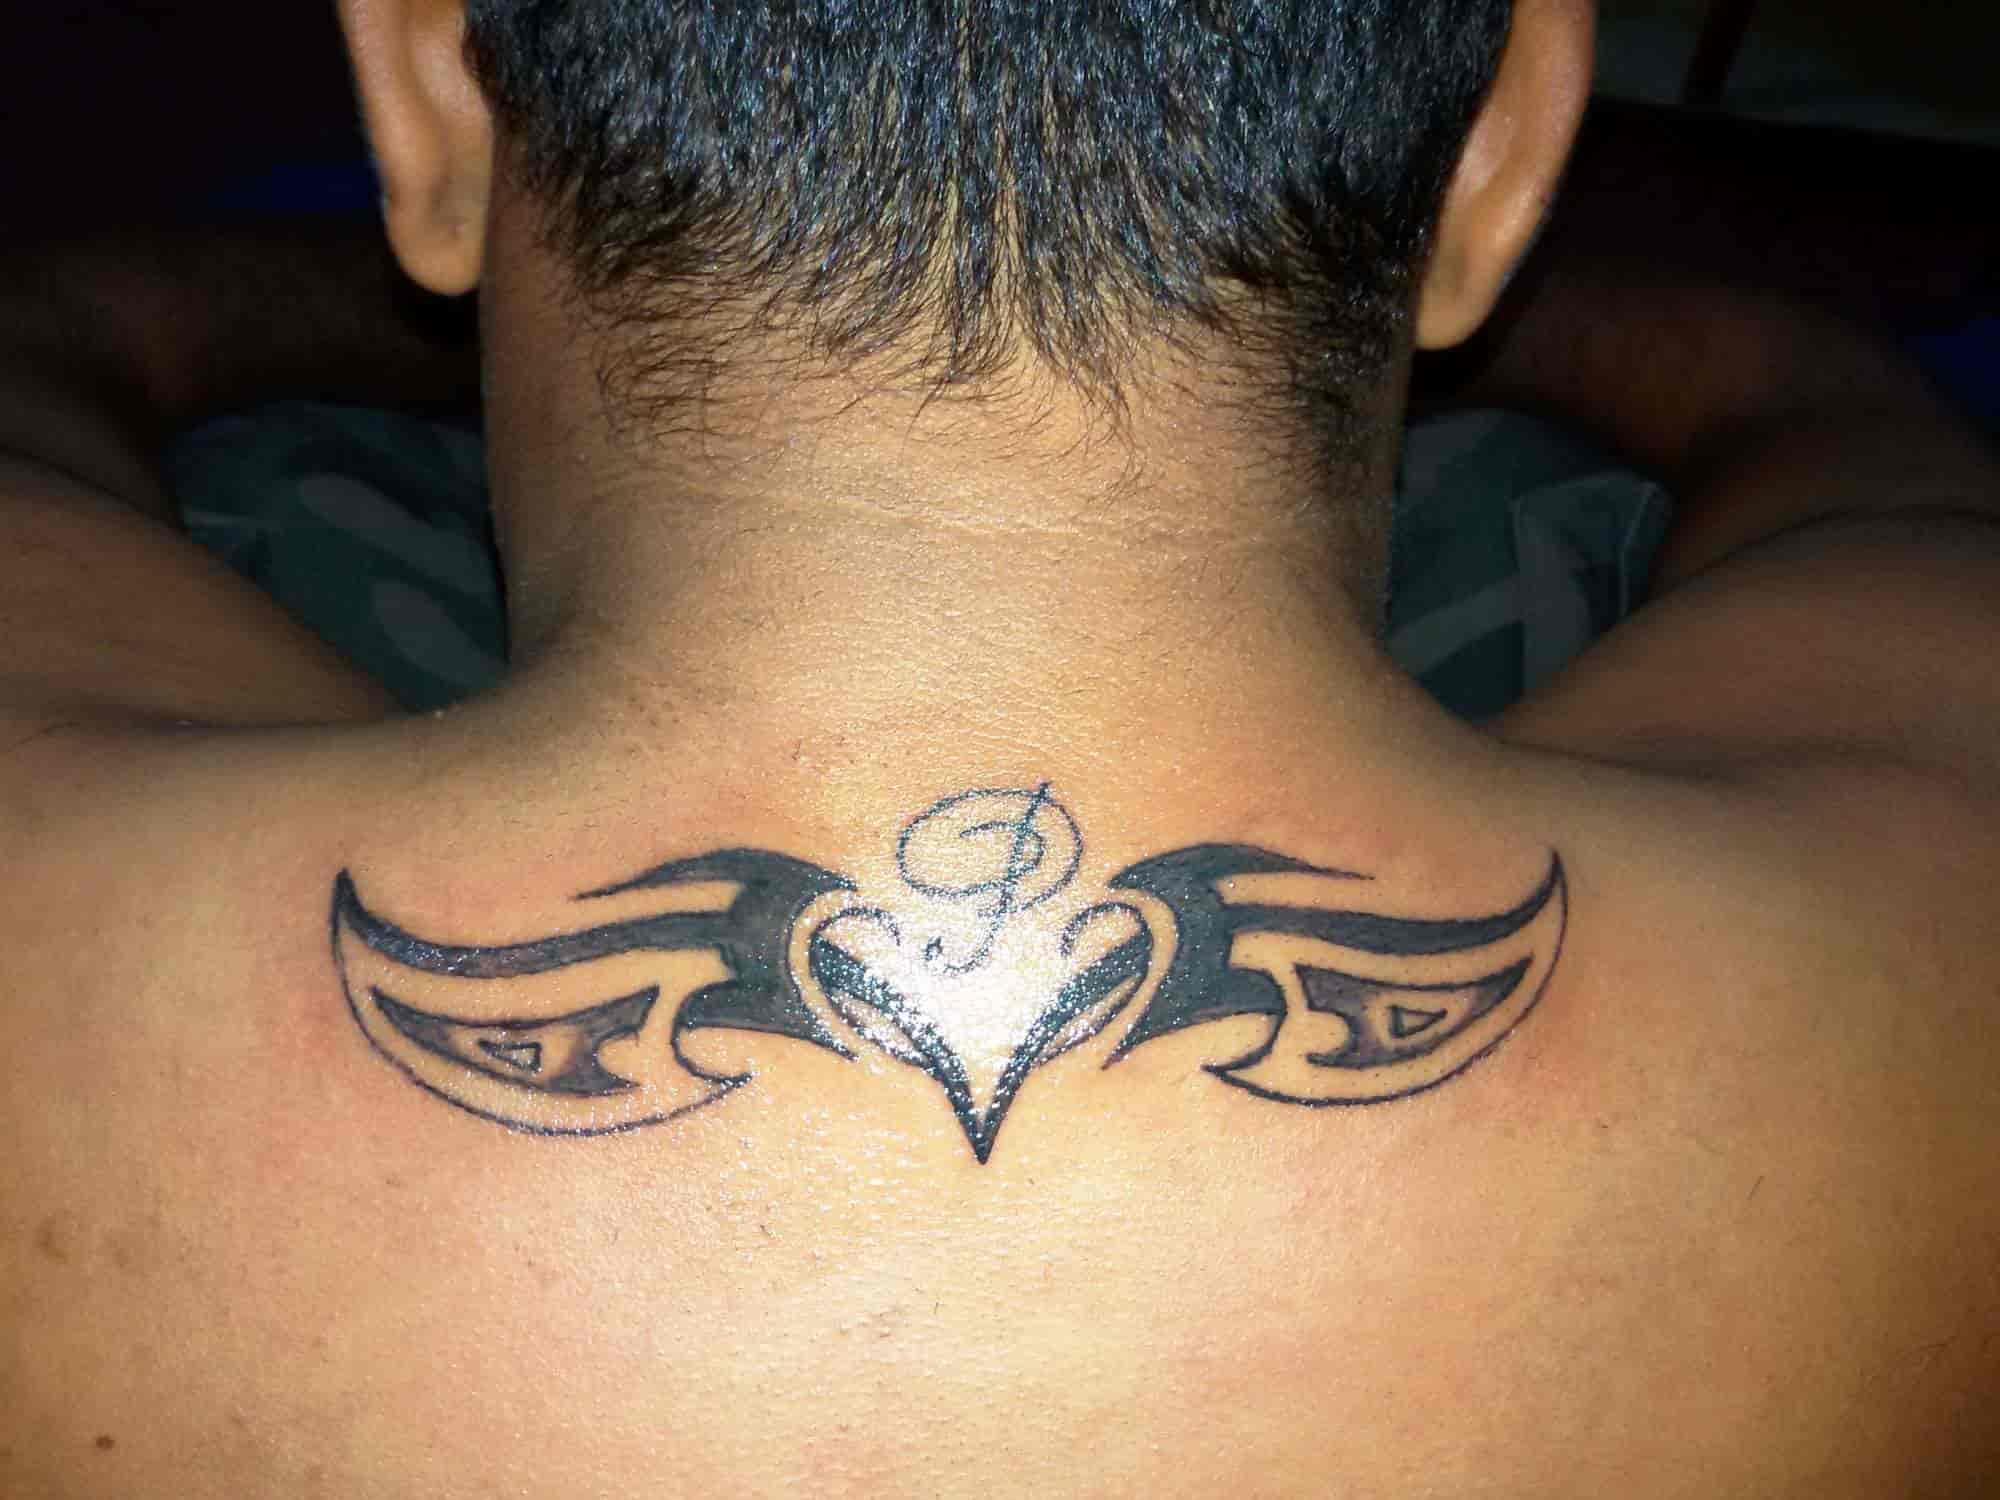 edbf52a43 Om Tattoos, Gandhipuram Coimbatore - Tattoo Parlours in Coimbatore -  Justdial